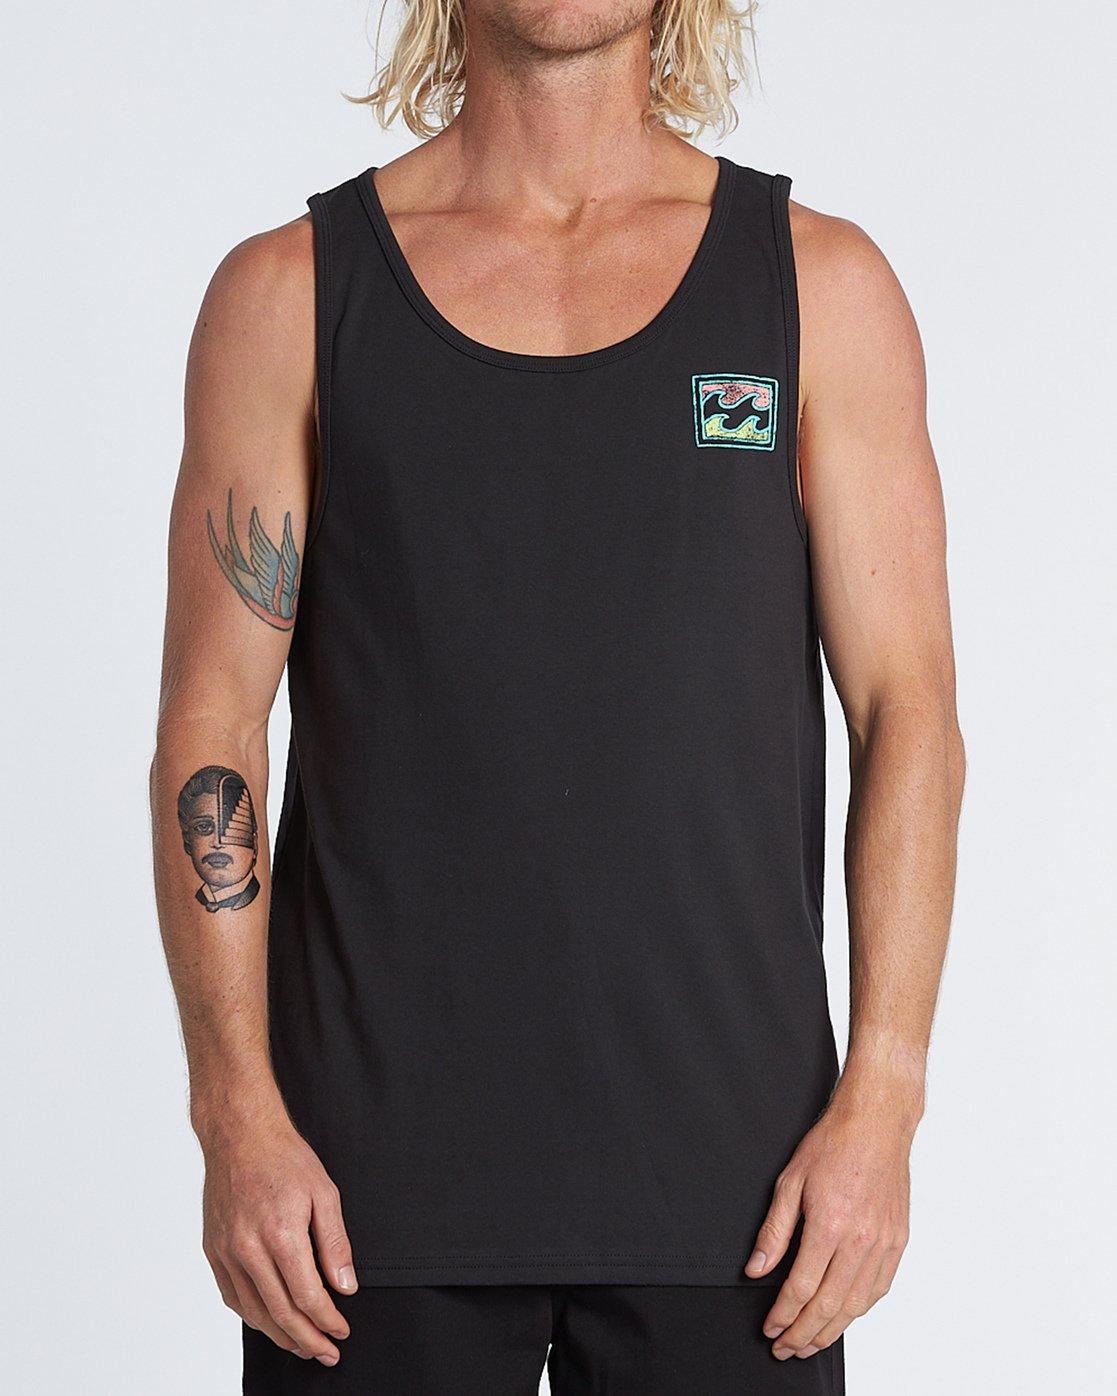 Billabong Fury Tank Tank Top Tank-Top Shirt lockeres Unterhemd W1 JE10 BIP6 0804